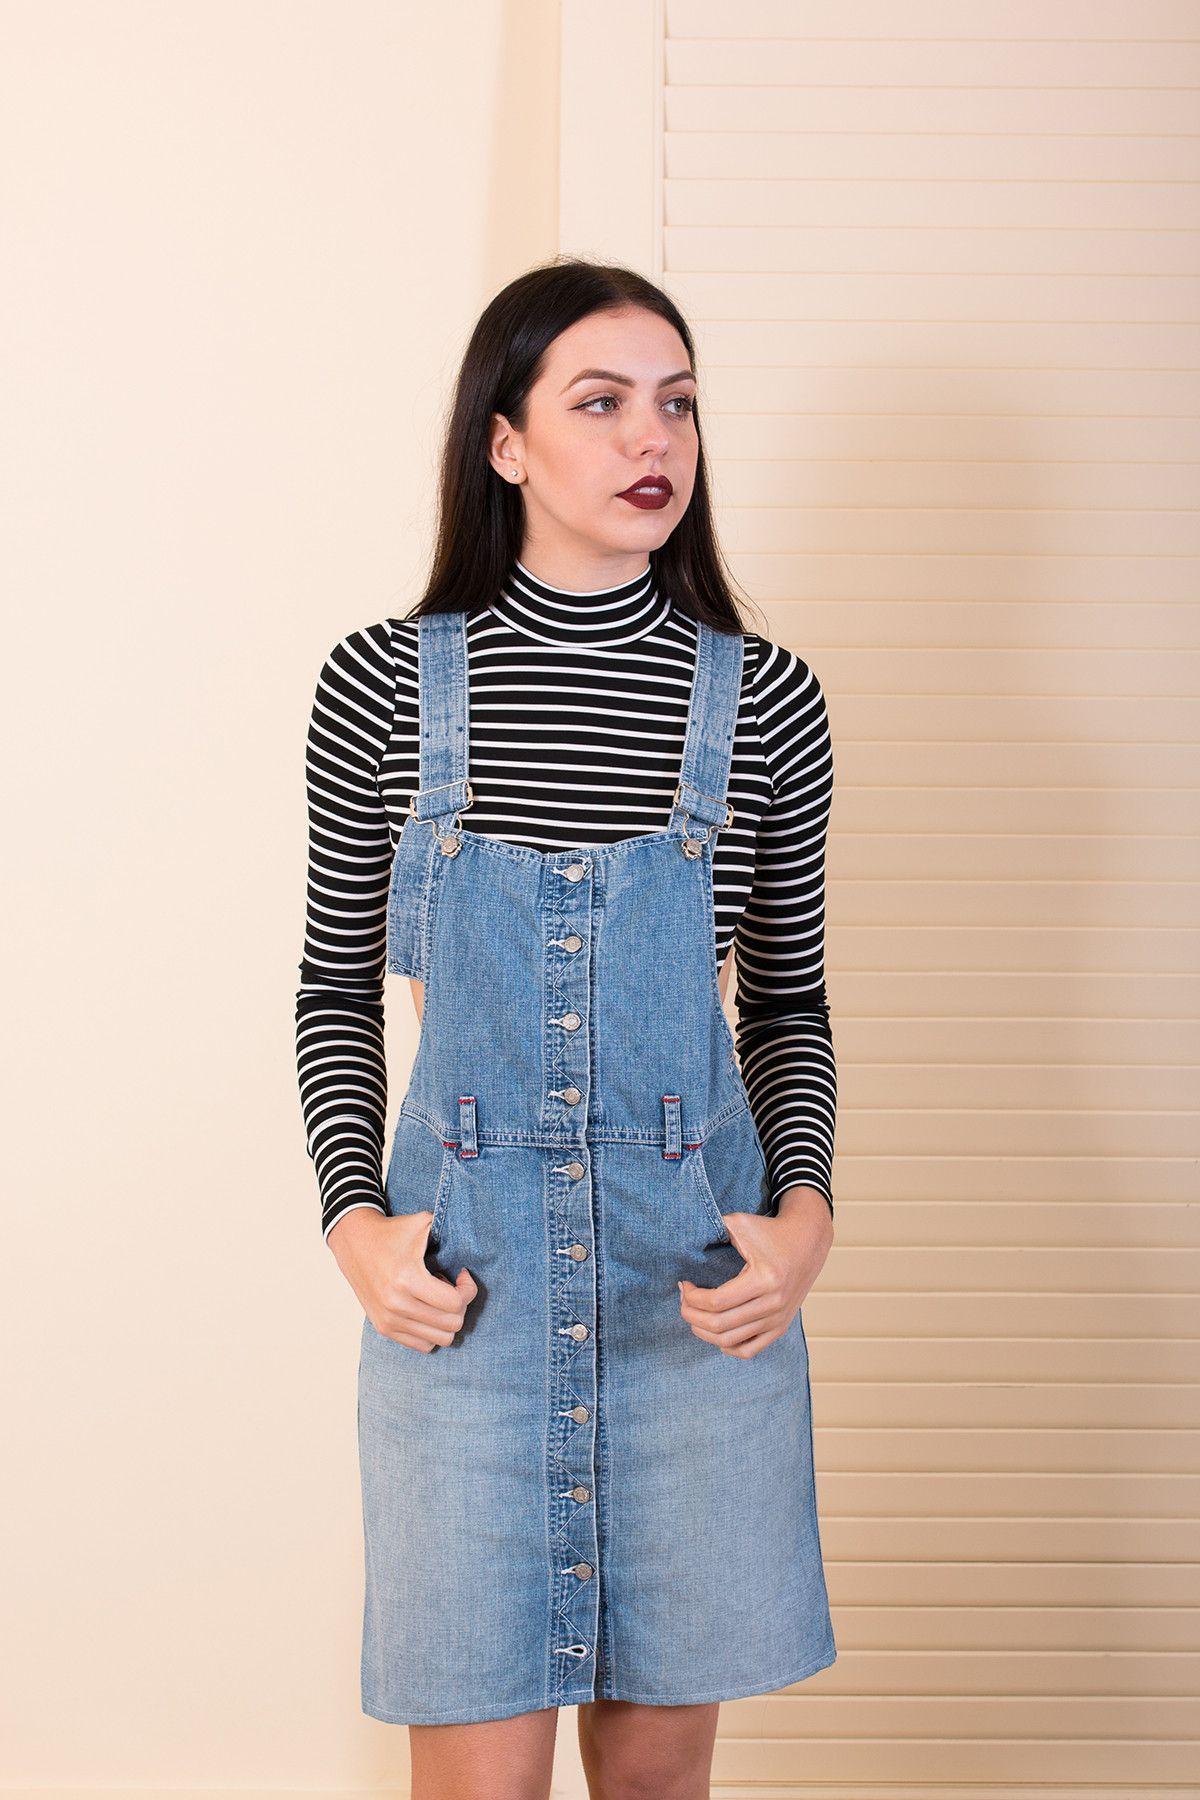 bdf873dc5022 Vintage Denim Overall Dress